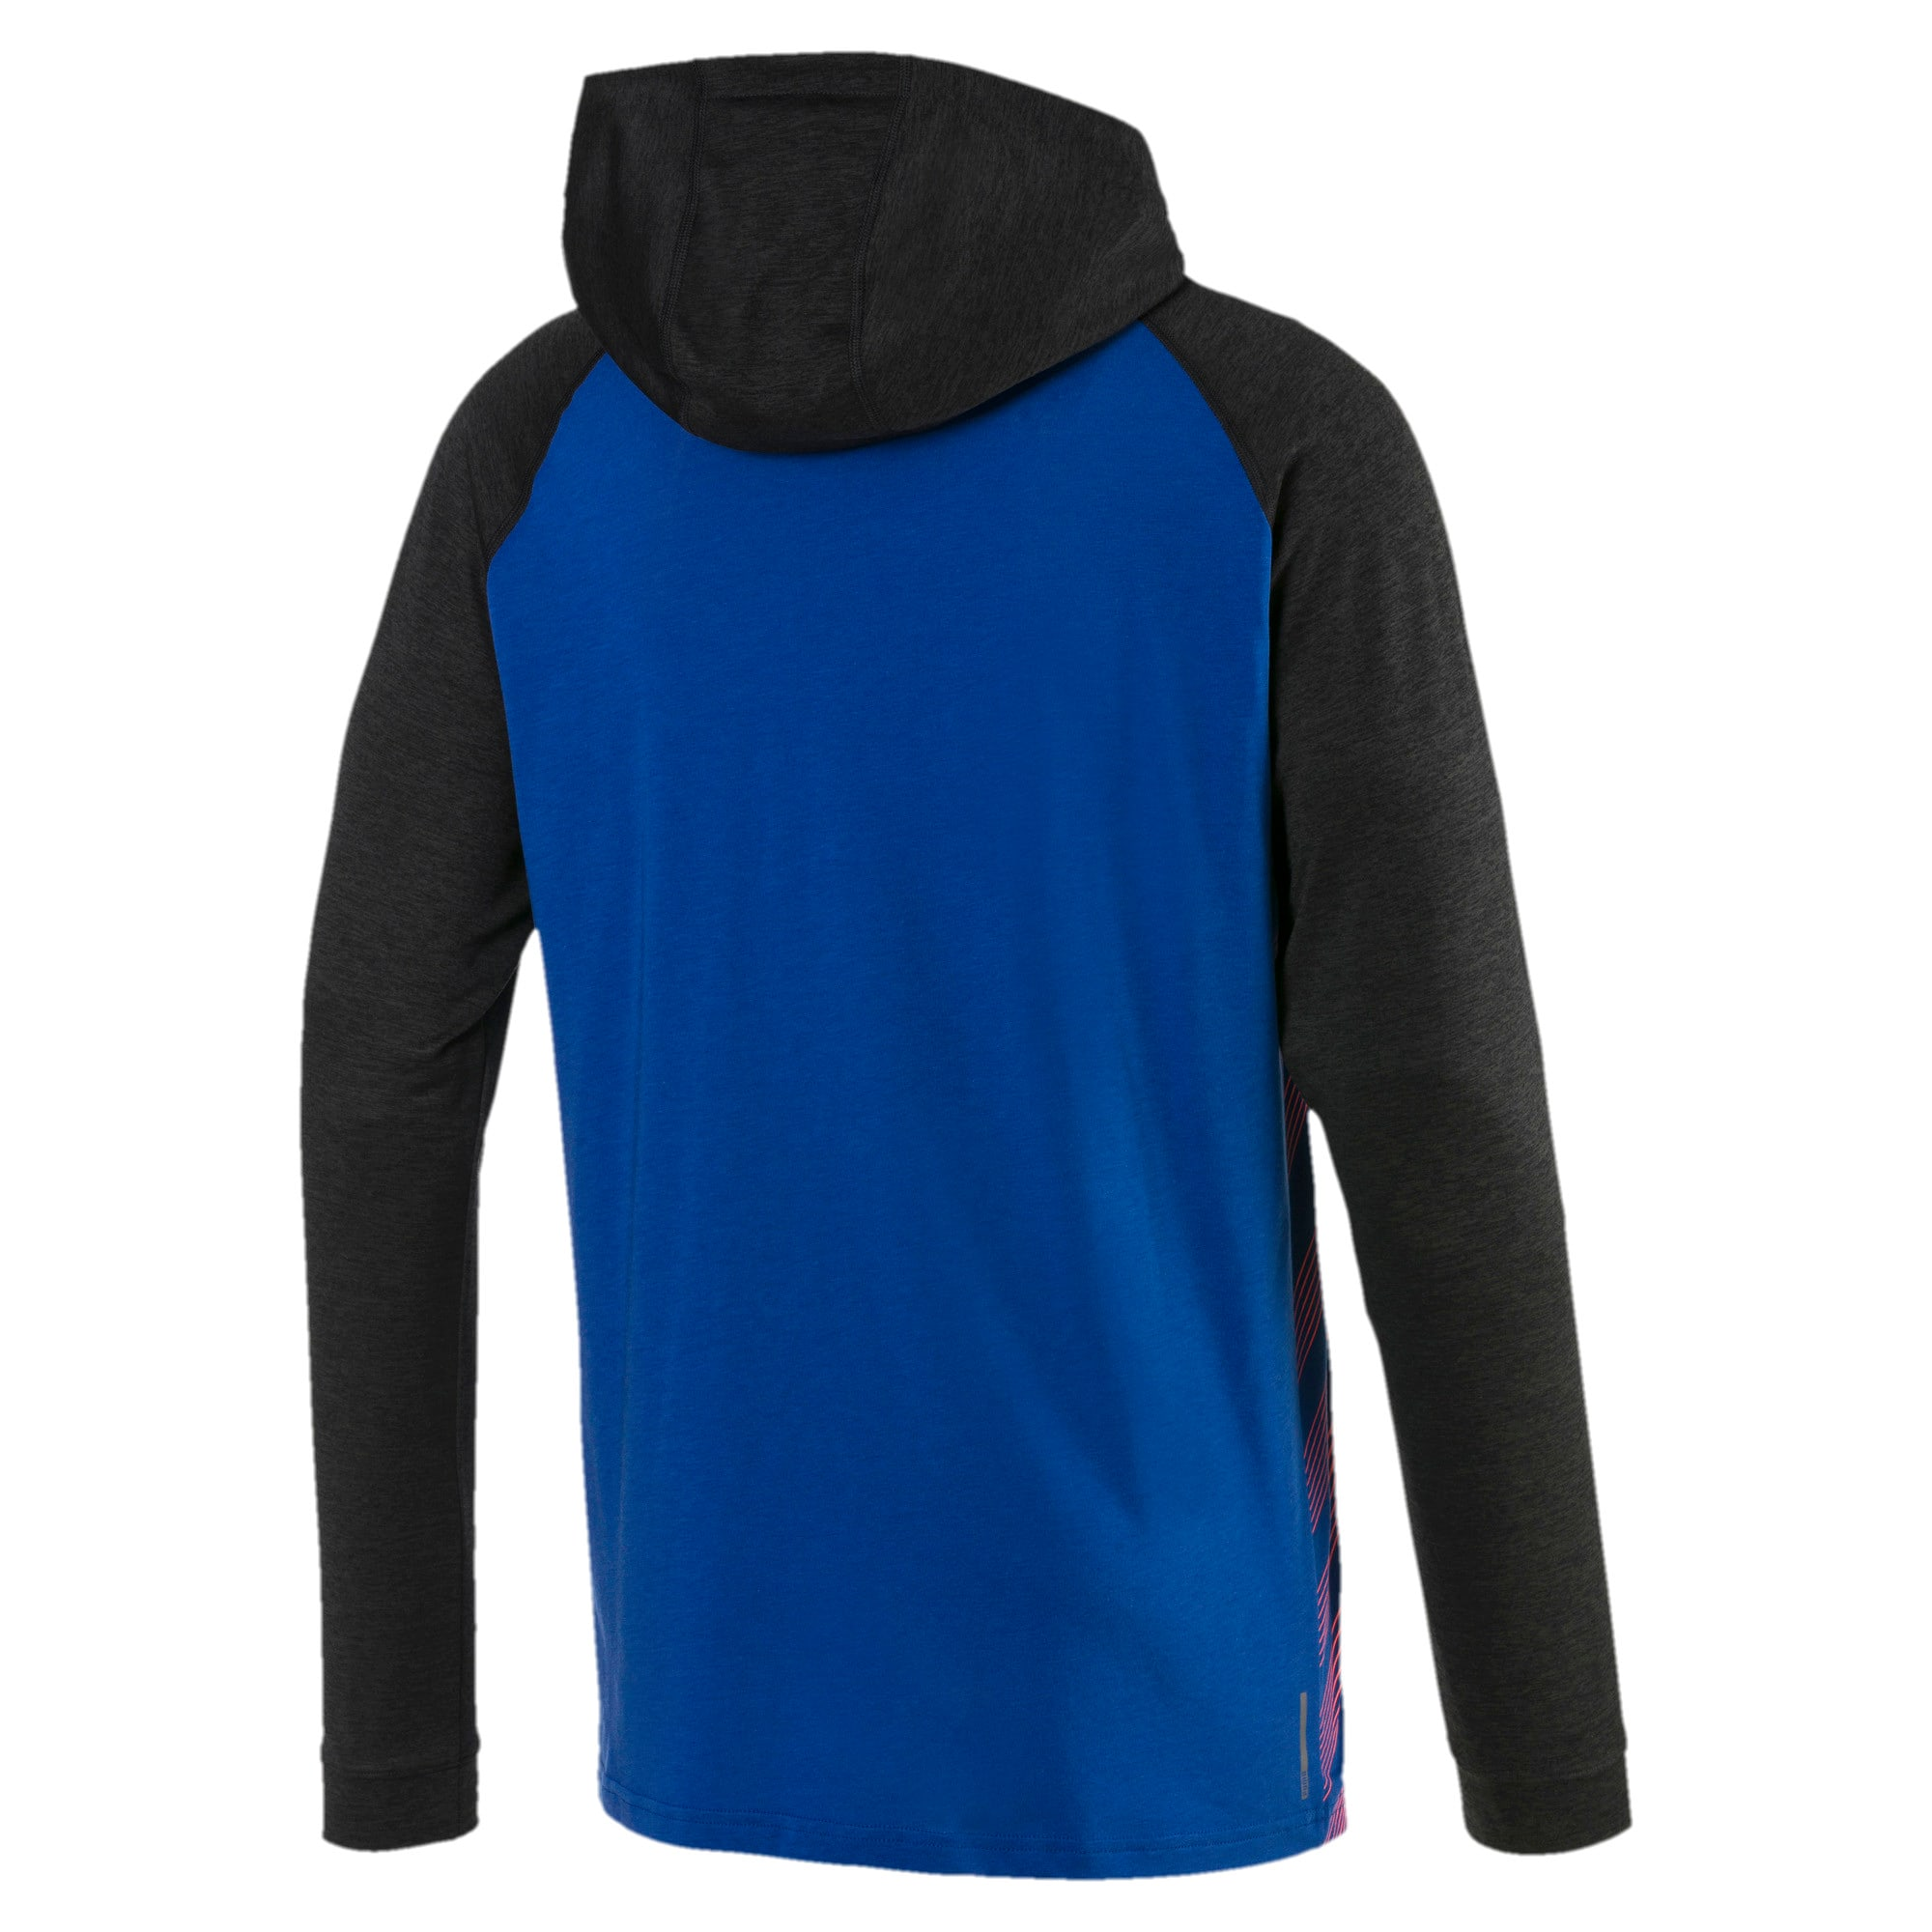 Thumbnail 5 of Collective Men's Long Sleeve Hooded Tee, Galaxy Blue-Black Heather, medium